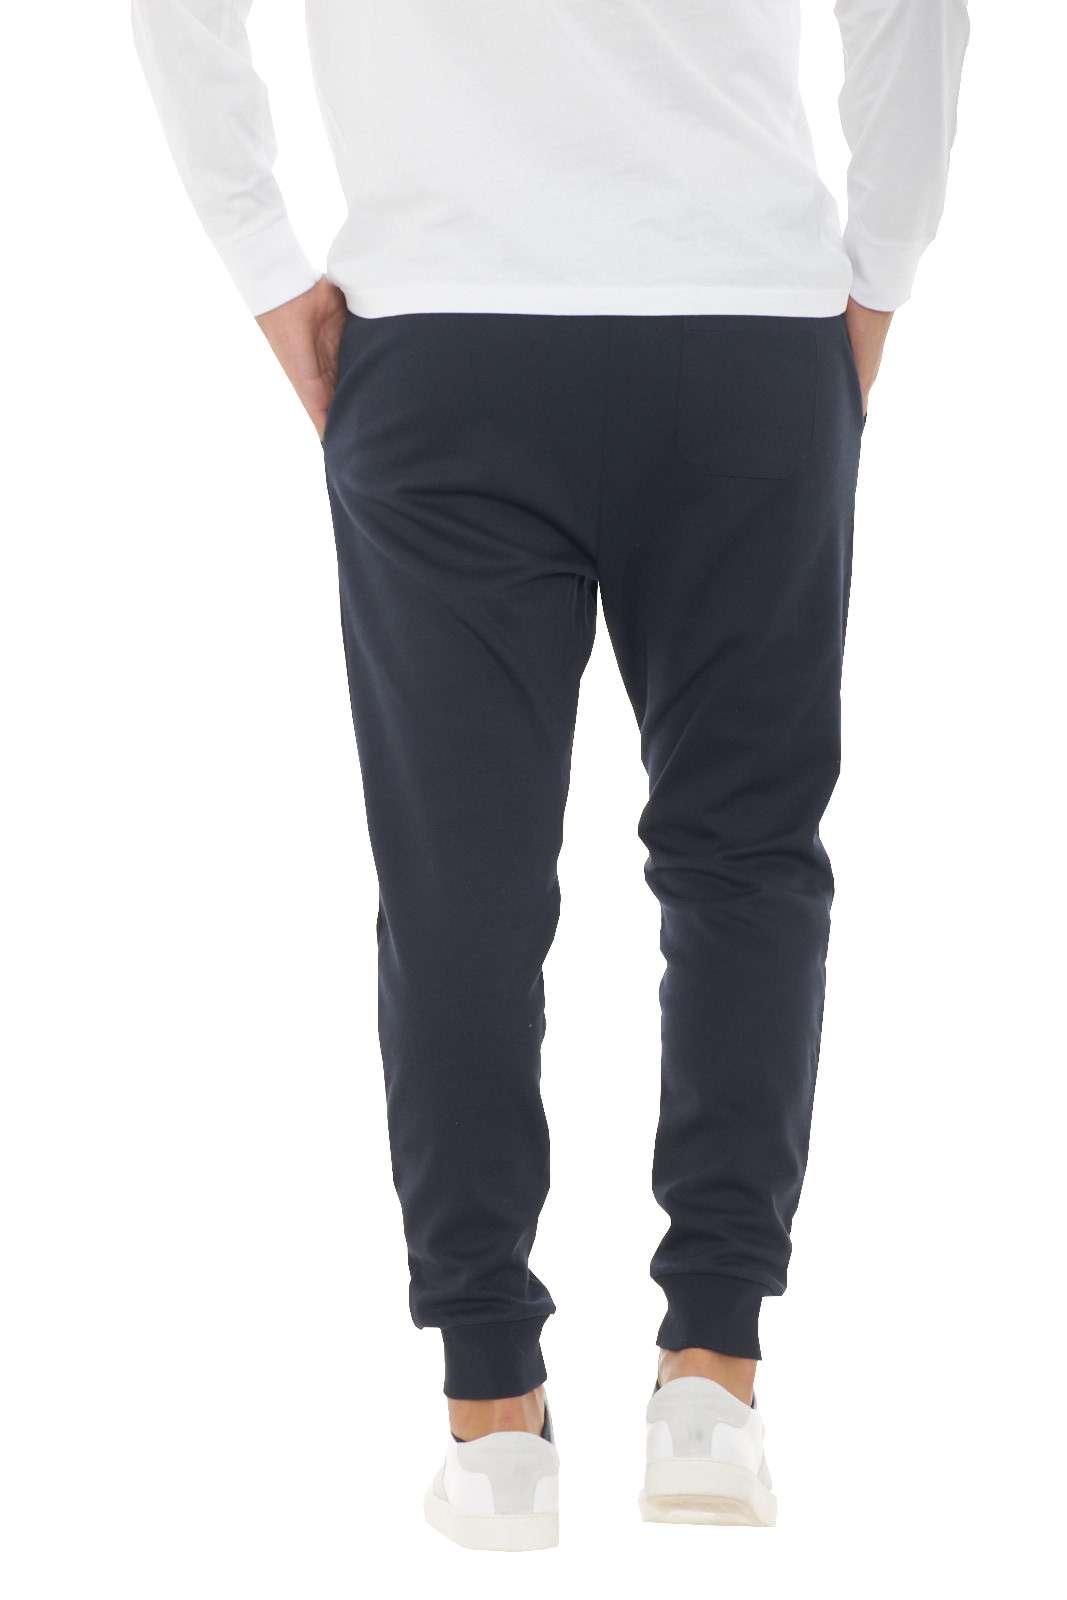 https://www.parmax.com/media/catalog/product/a/i/AI-outlet_parmax-pantaloni-uomo-Ralph-Lauren-710652314001-C_1.jpg